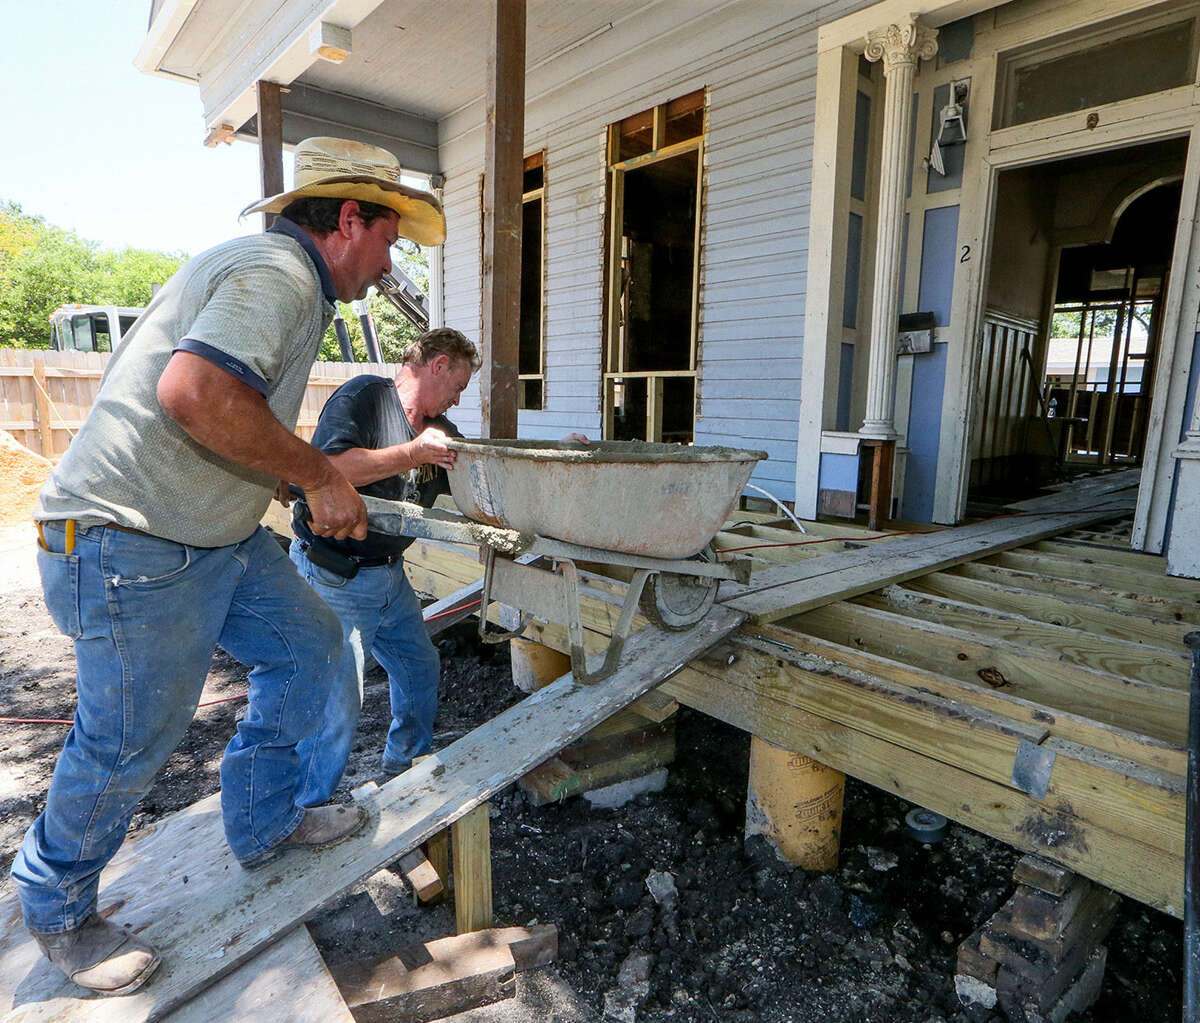 Jim Hogarth (right) helps Carmello Pas push a wheelbarrow of concrete into a Victorian style house he is rebuilding at 506 Dakota near the Alamodome.